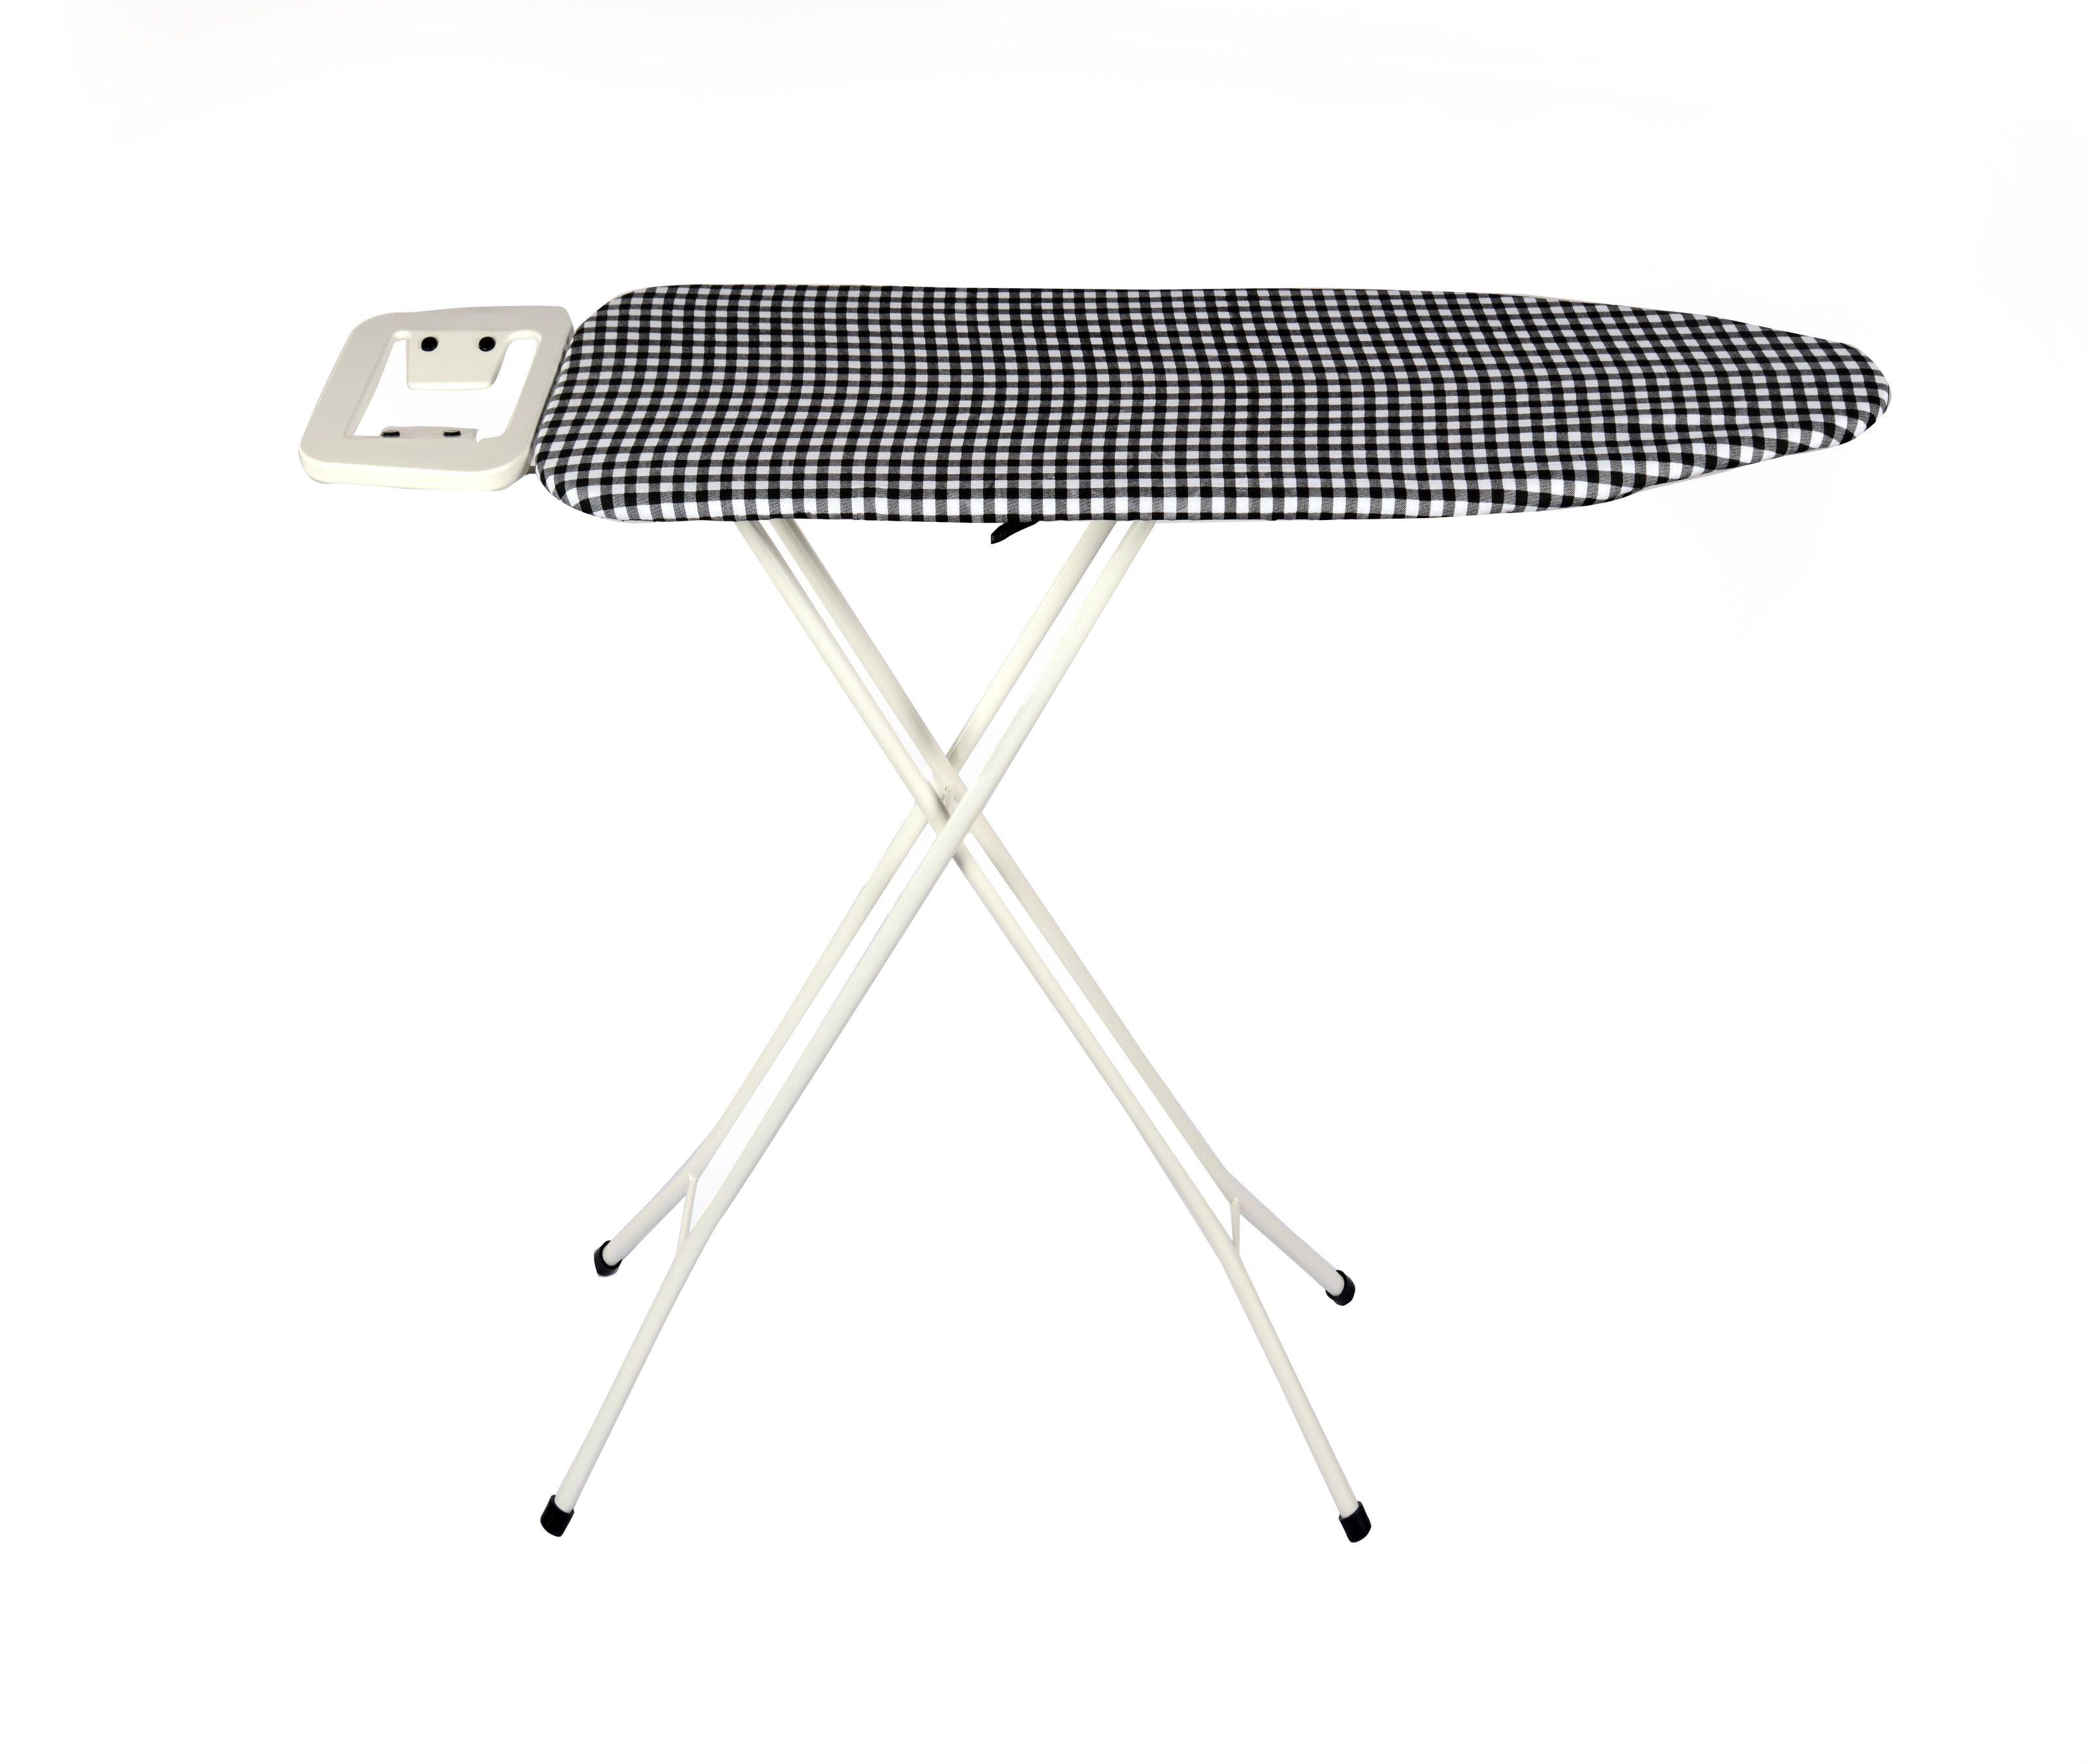 Foldable Ironing Board 110X33 Cm With Rectangular Iron Rest & Black Check Fabric Cover-ELATION - Eurostar